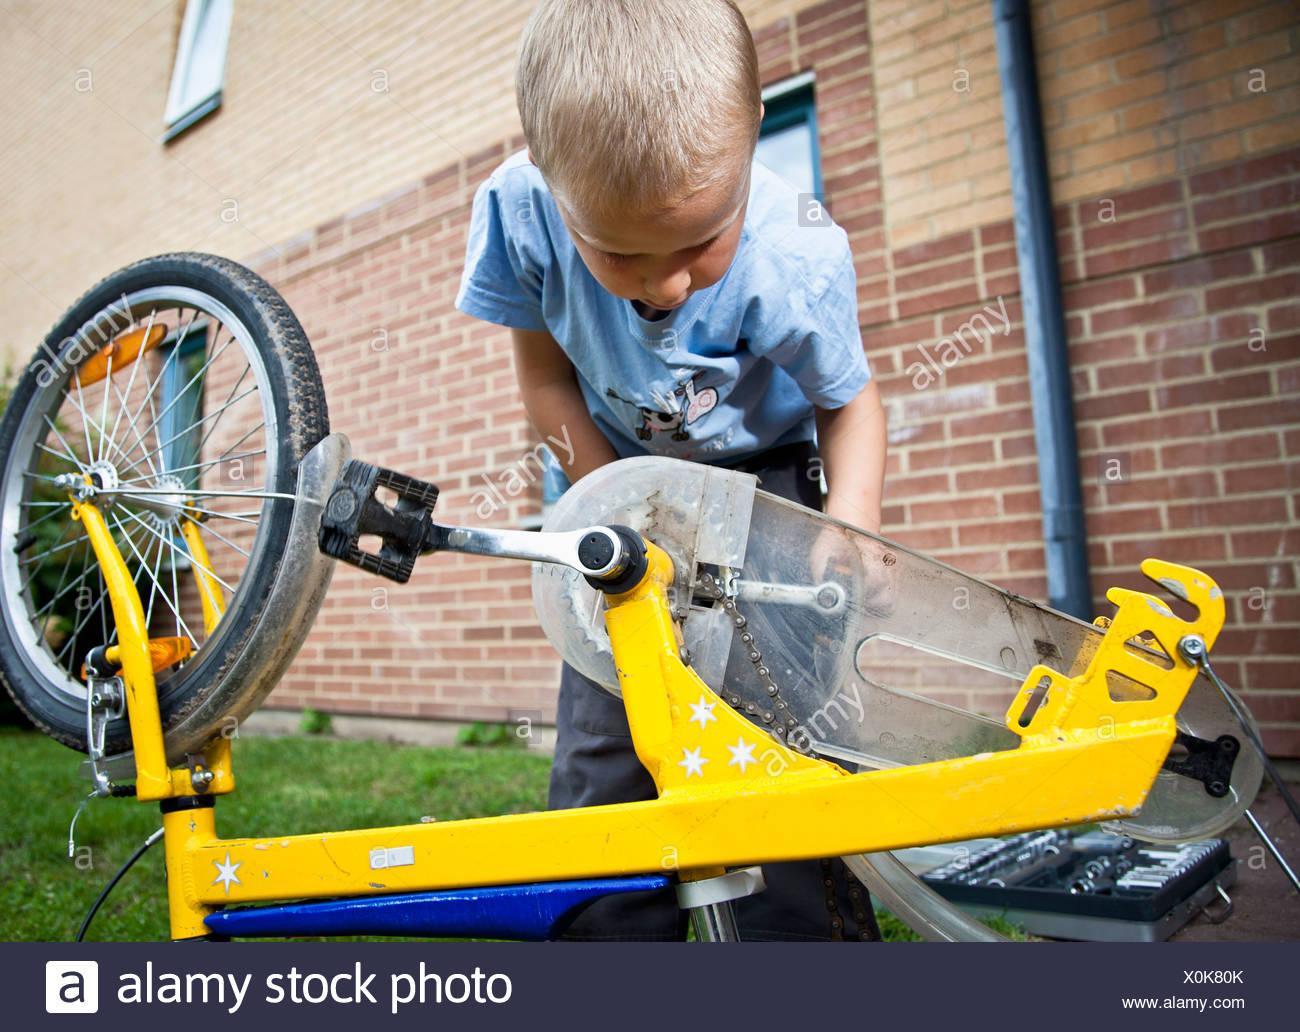 Boy repairing cycle - Stock Image